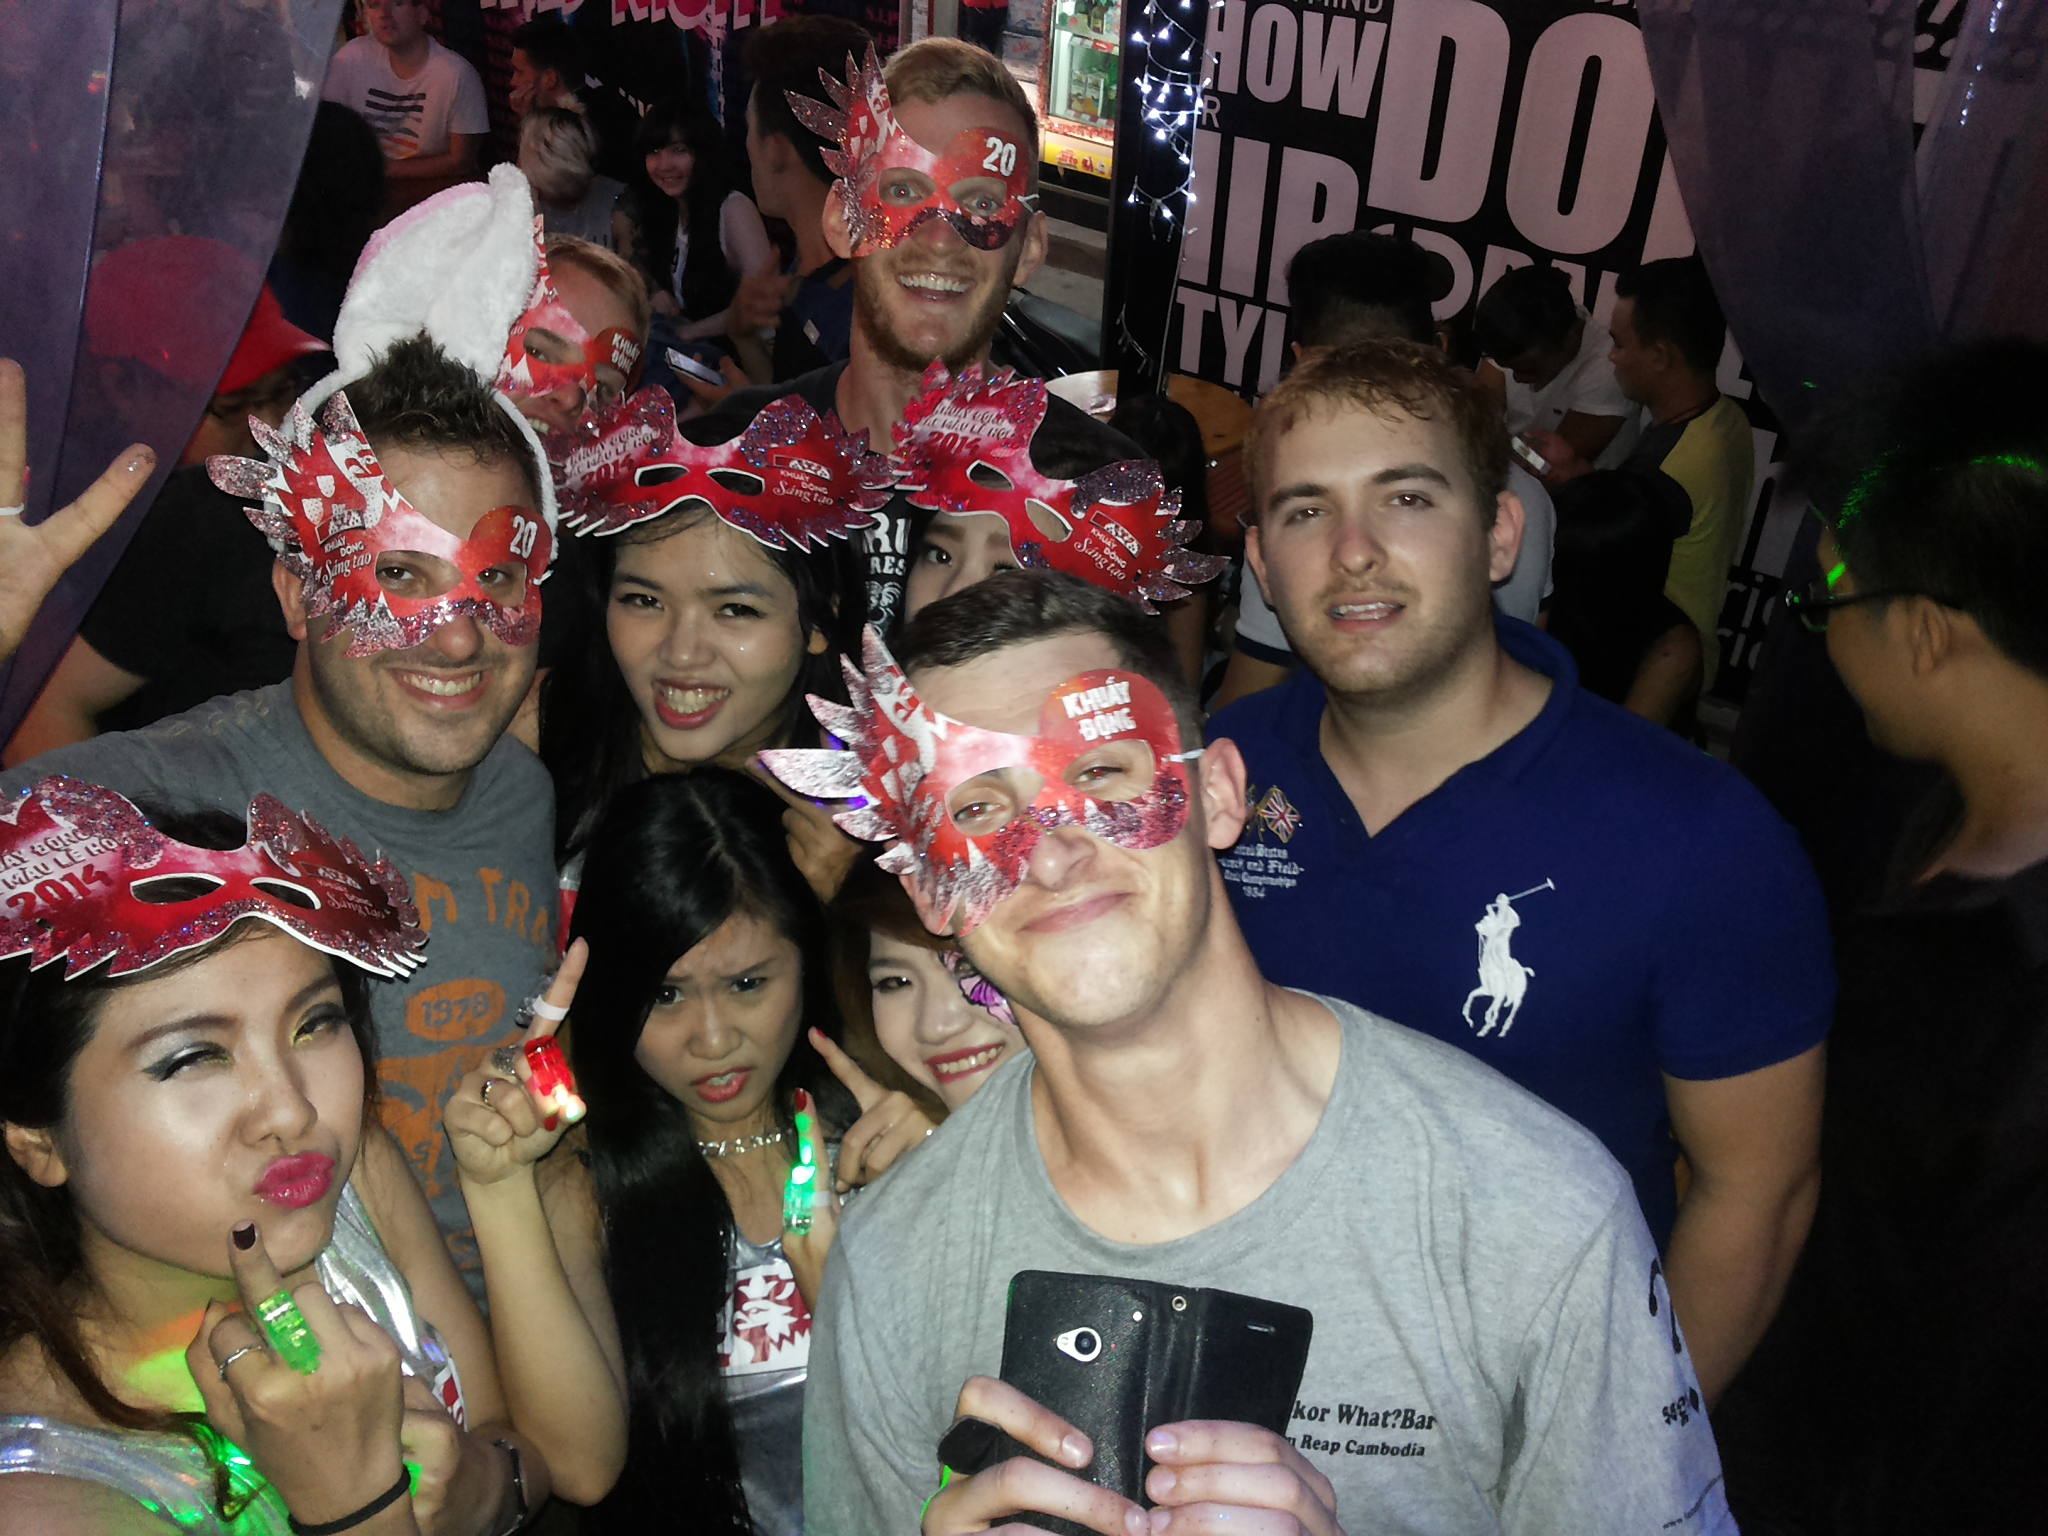 New Year 2014 in Saigon